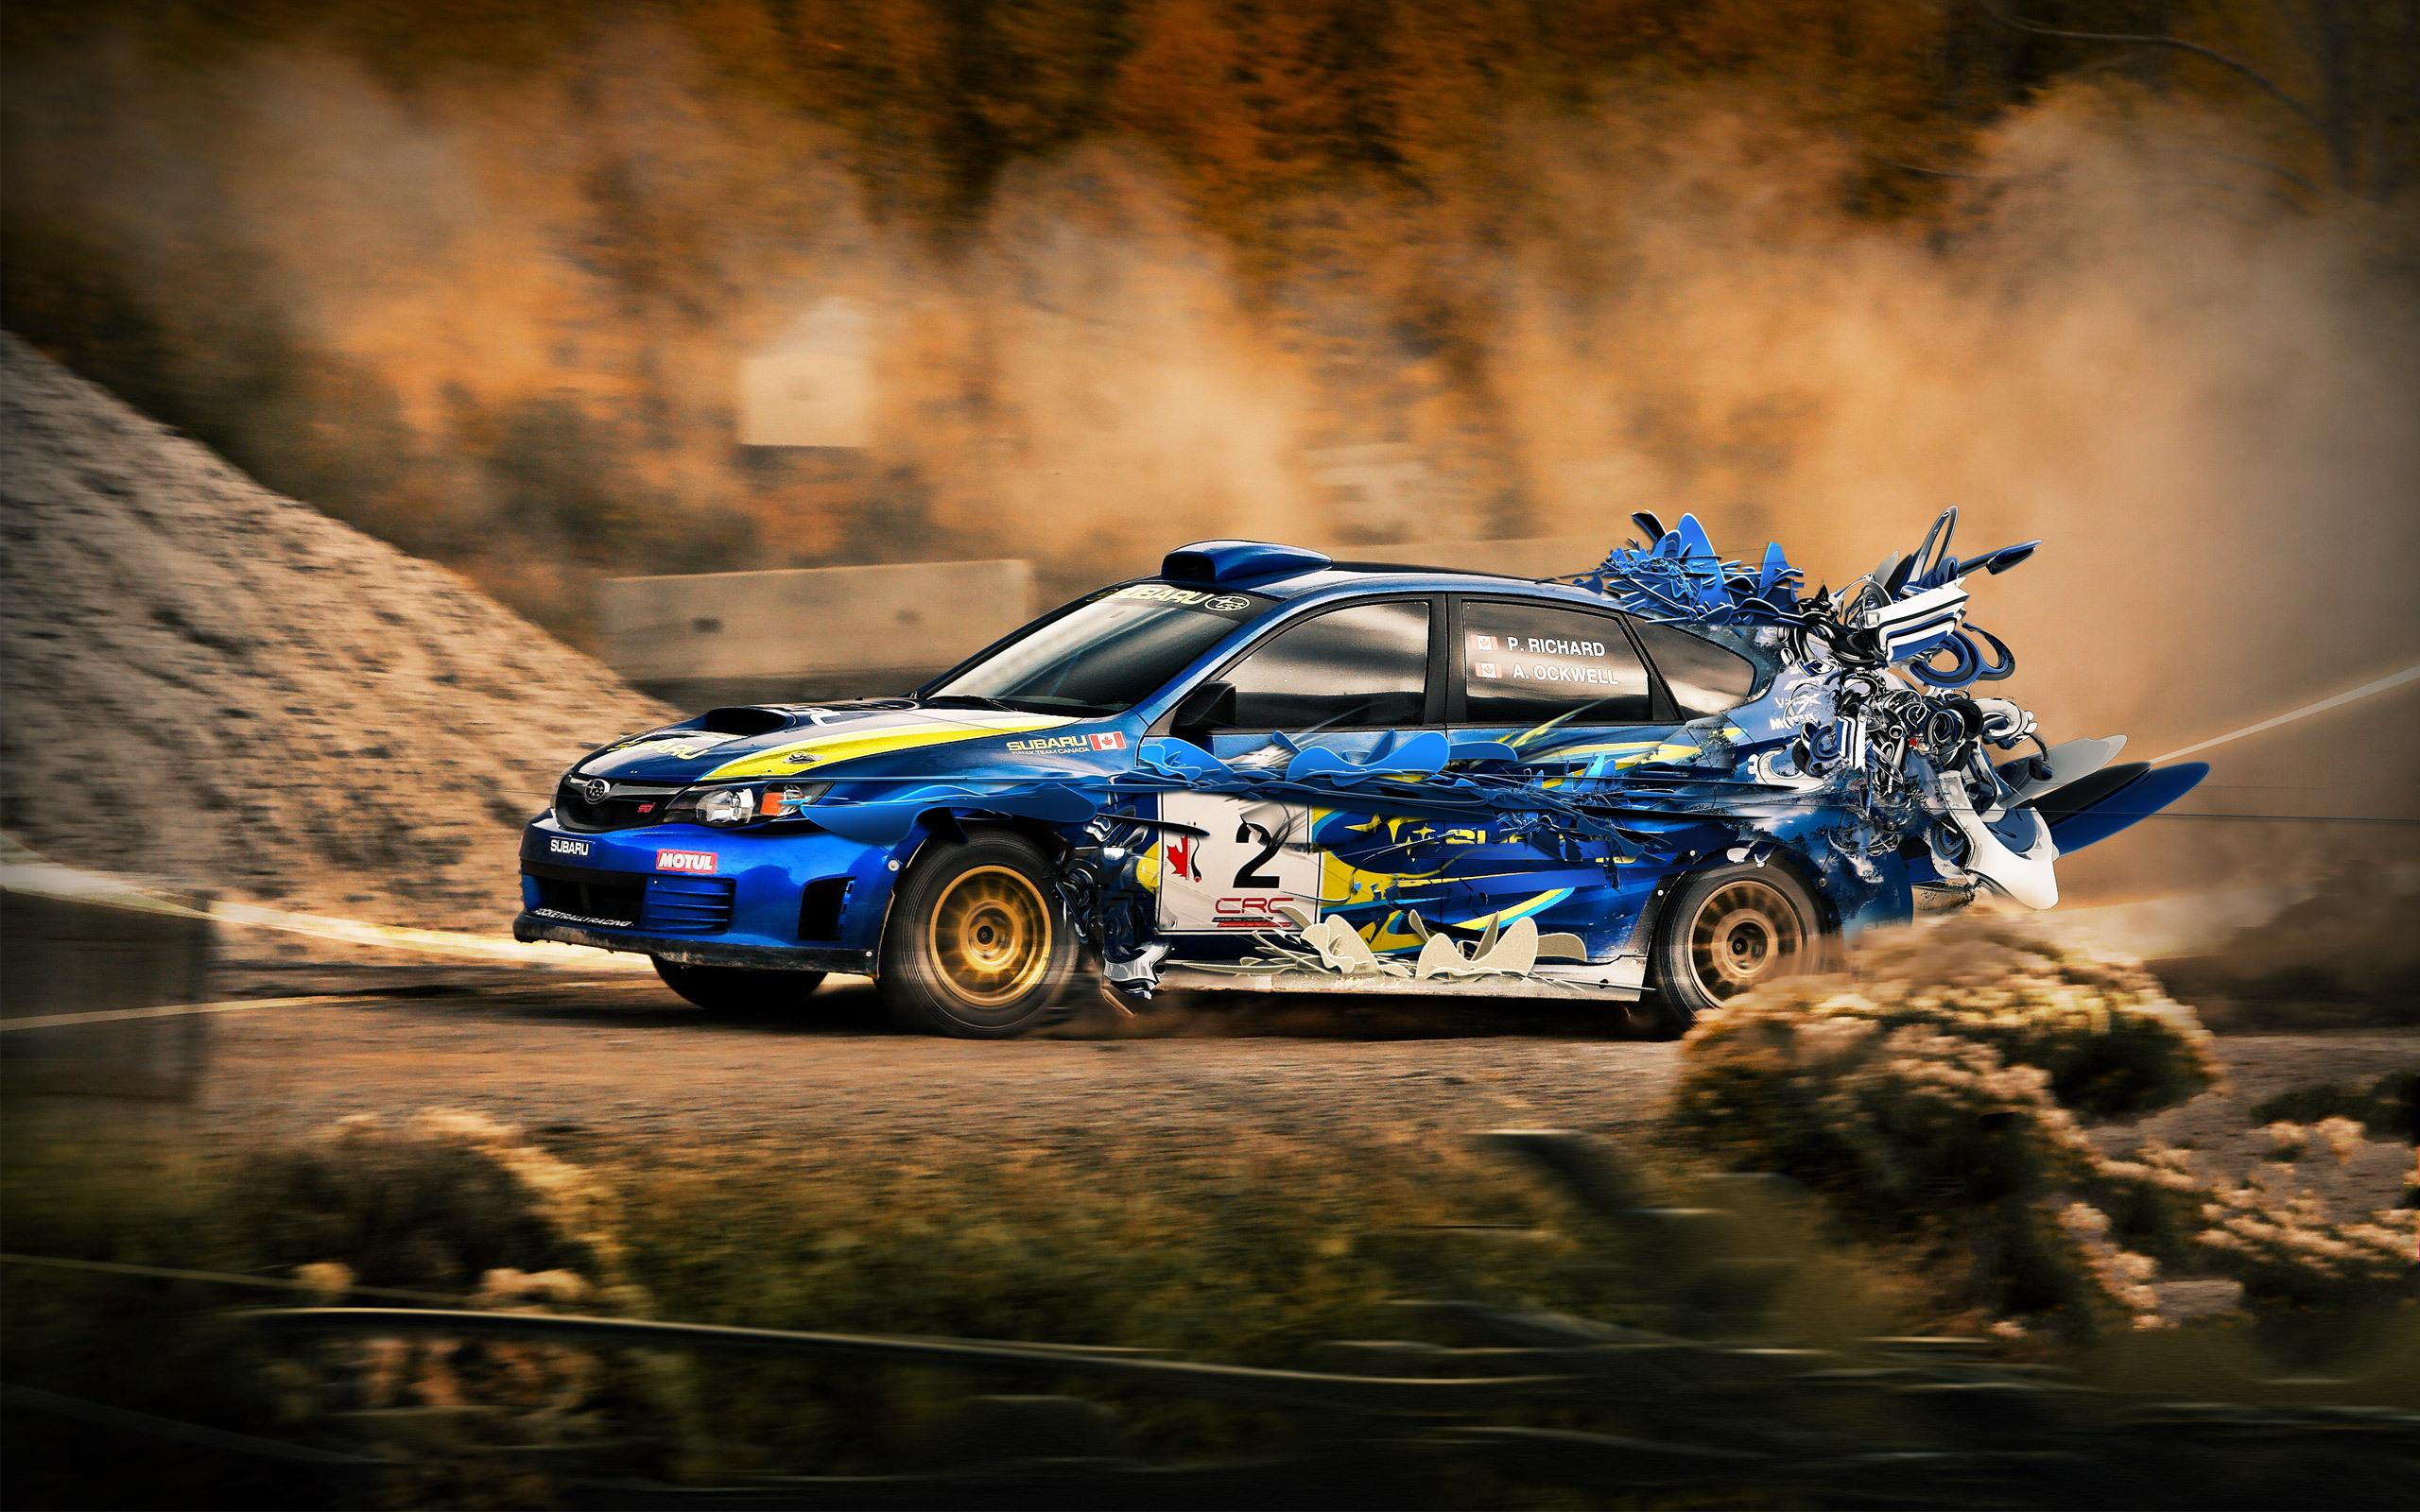 Picture Subaru Cars